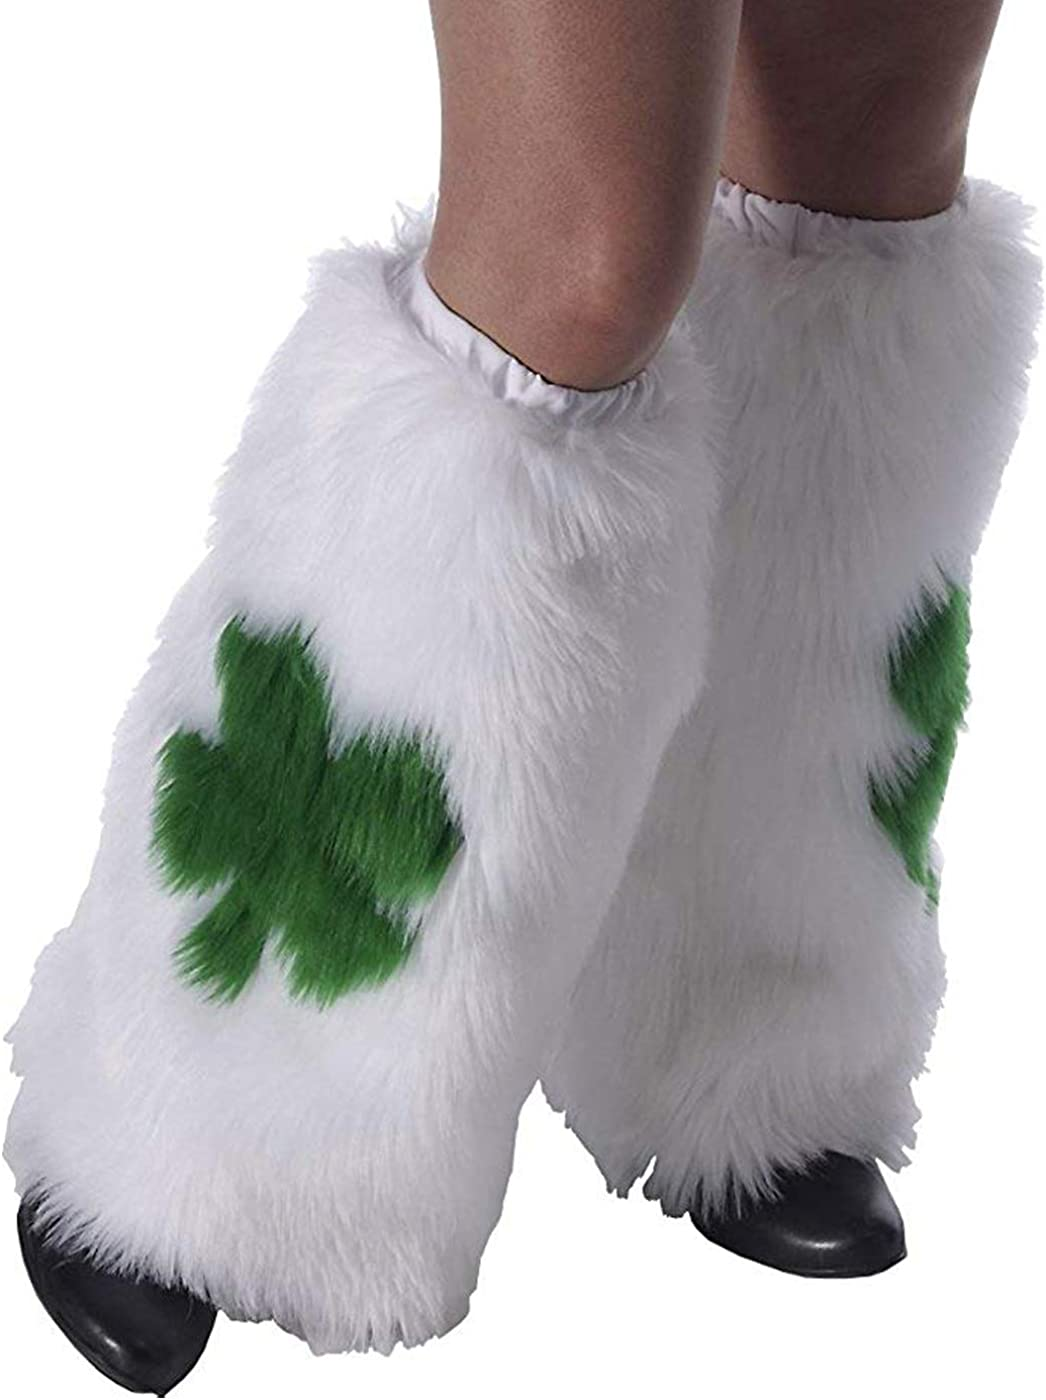 Forum Novelties Womens Faux Fur Leg Warmers